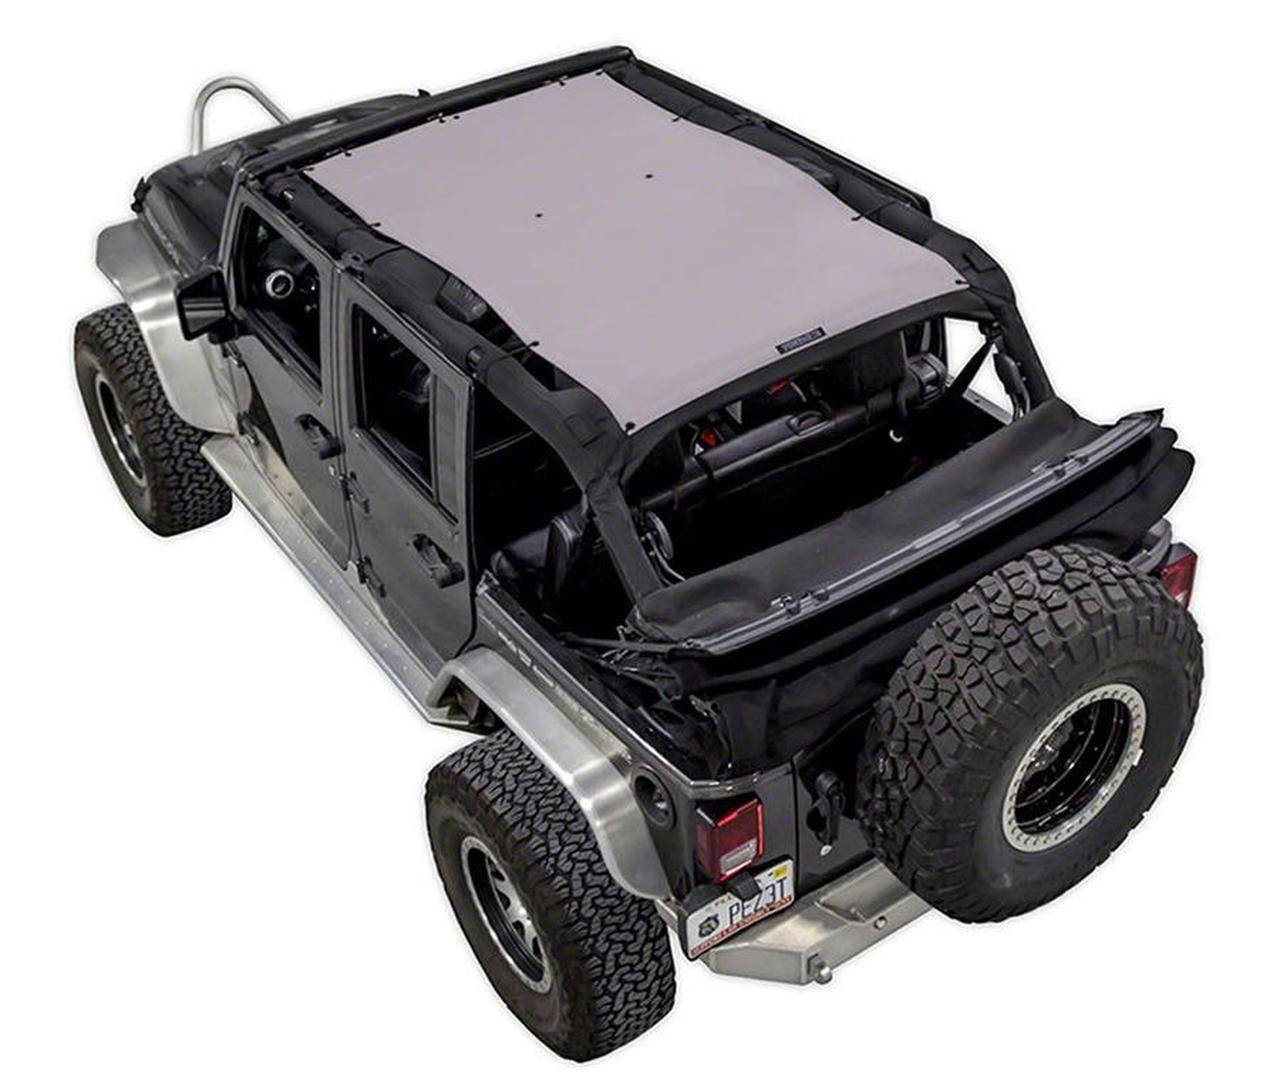 SpiderWeb Shade Trail Mesh ShadeTop - Gray (07-18 Jeep Wrangler JK 4 Door)